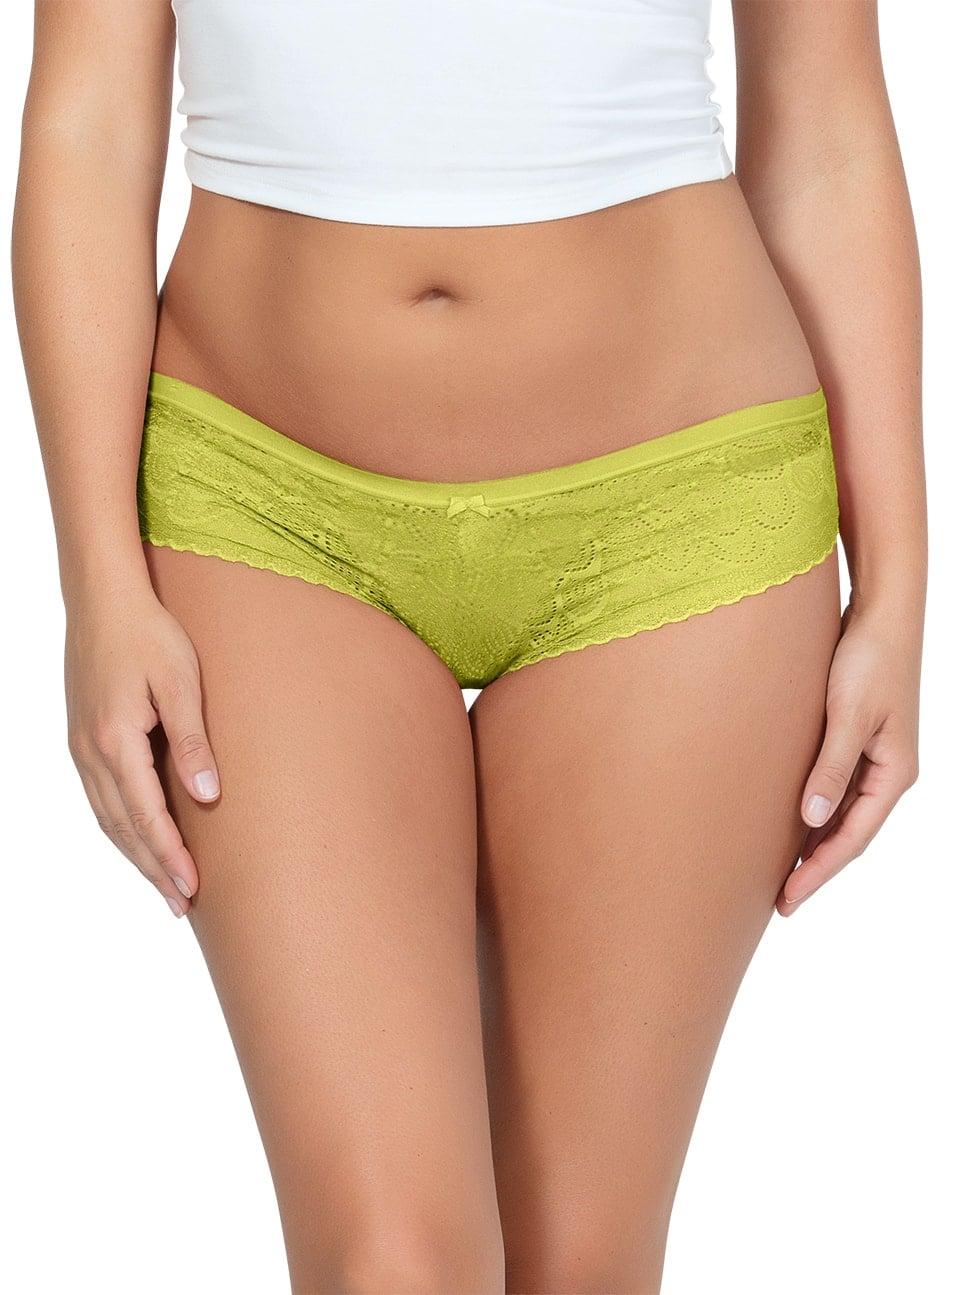 PARFAIT ParfaitPanty SoGlam HipsterPP502 Lemonade Front - Panty So Glam Hipster - Lemonade - PP502